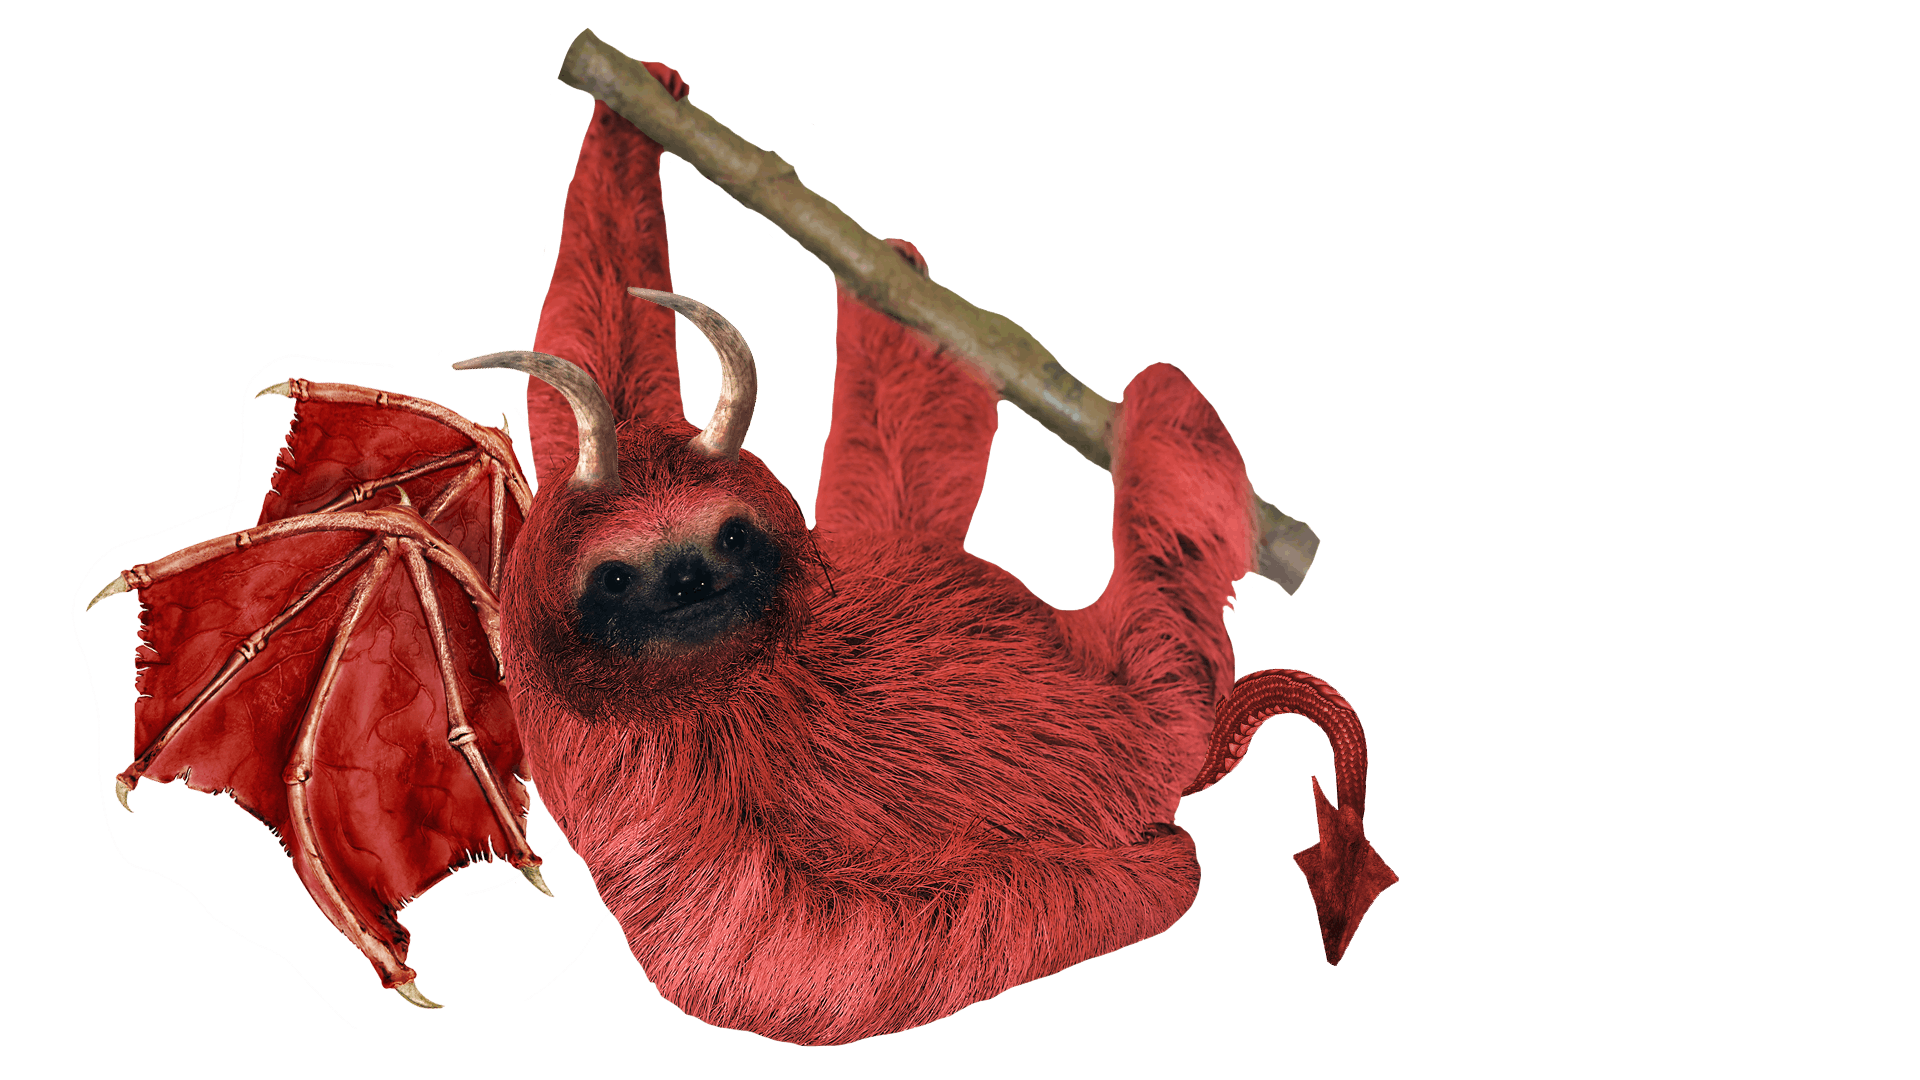 Dragon sloth